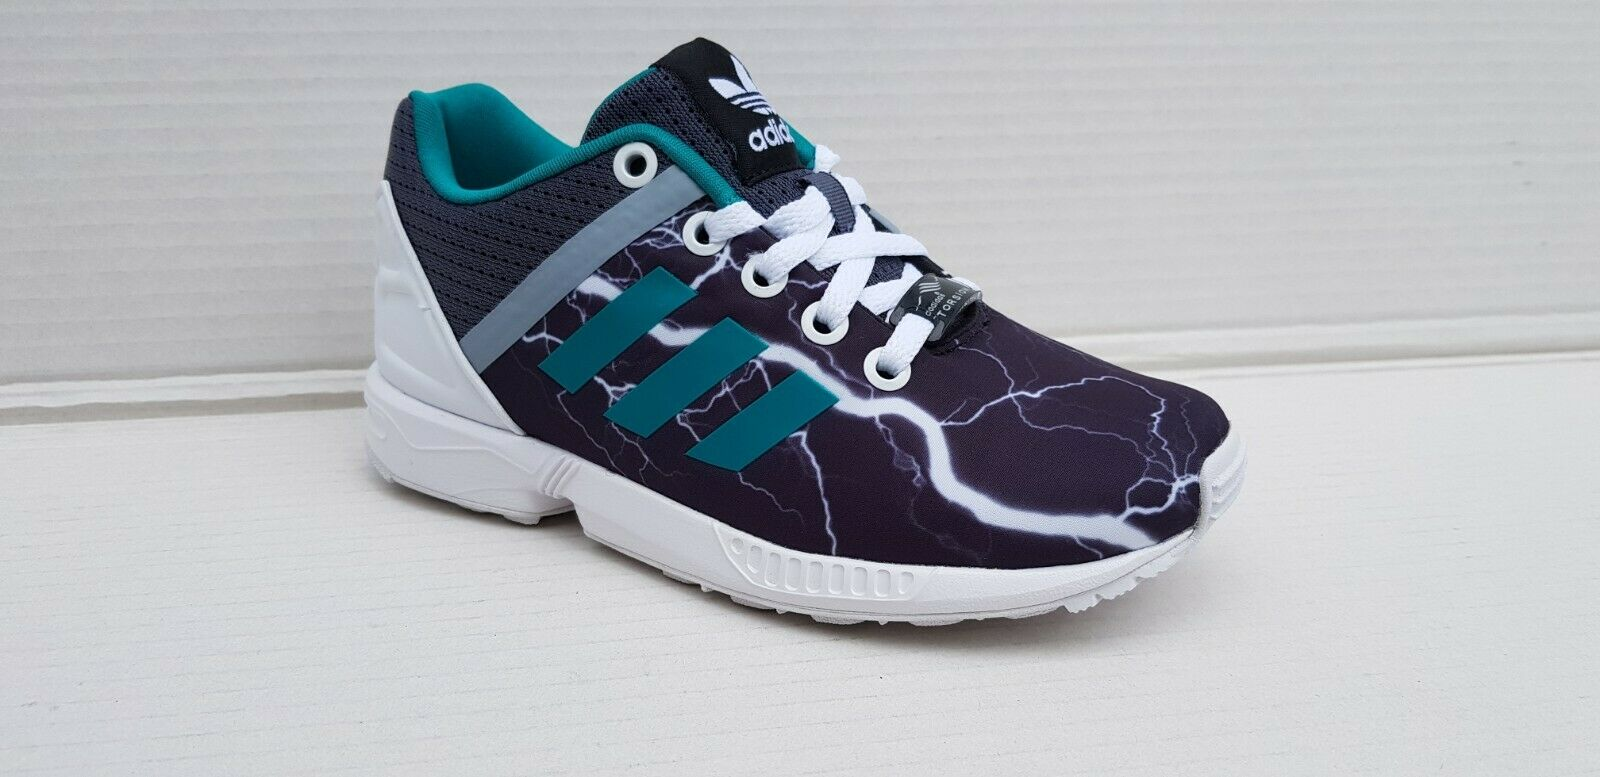 Adidas Kinderschuhe Zx Flux Test Vergleich +++ Adidas